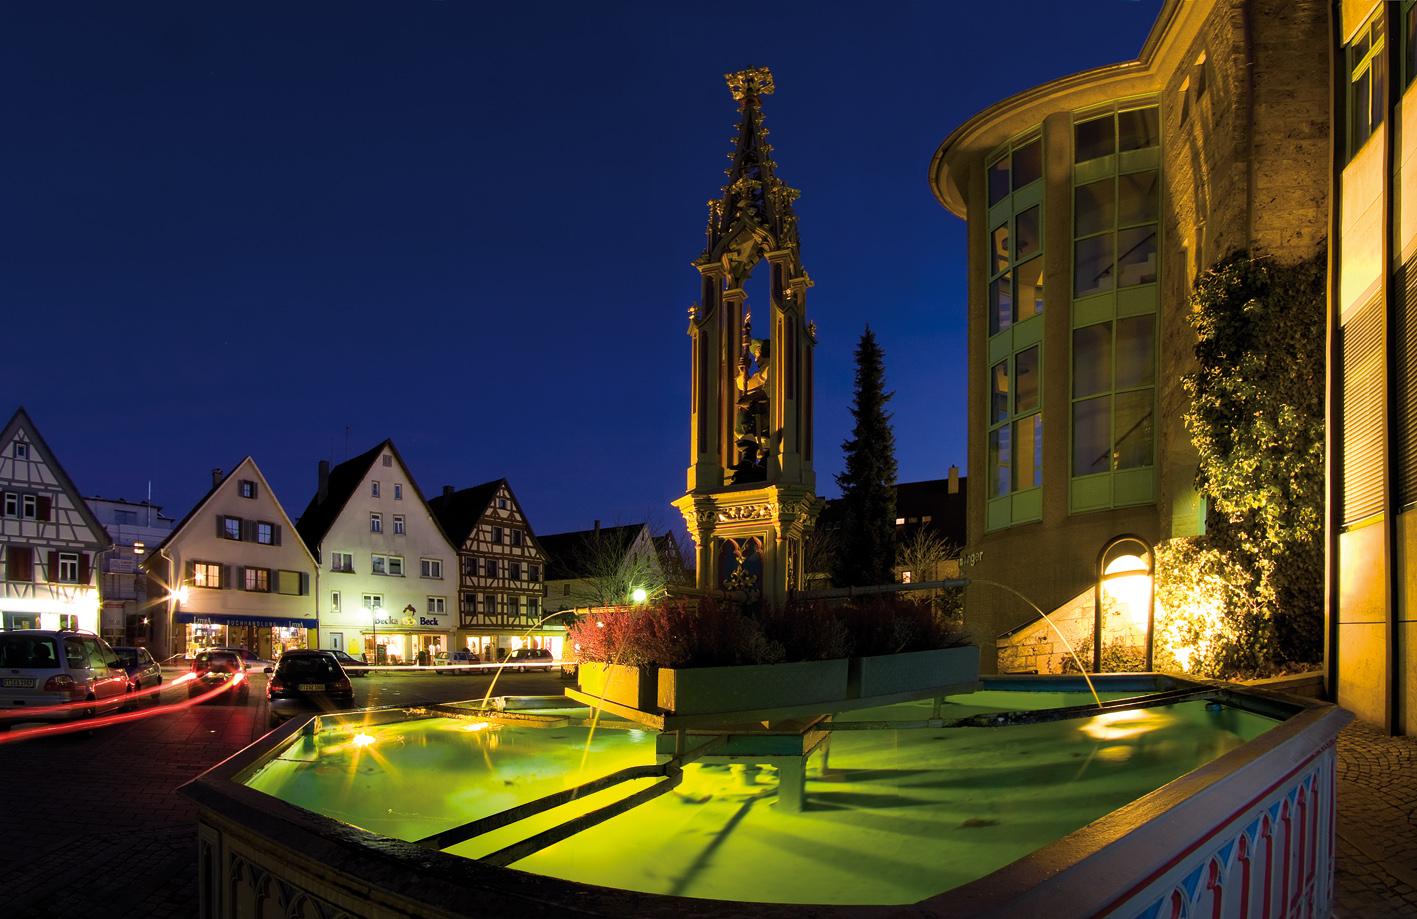 lammbrunnen-nacht